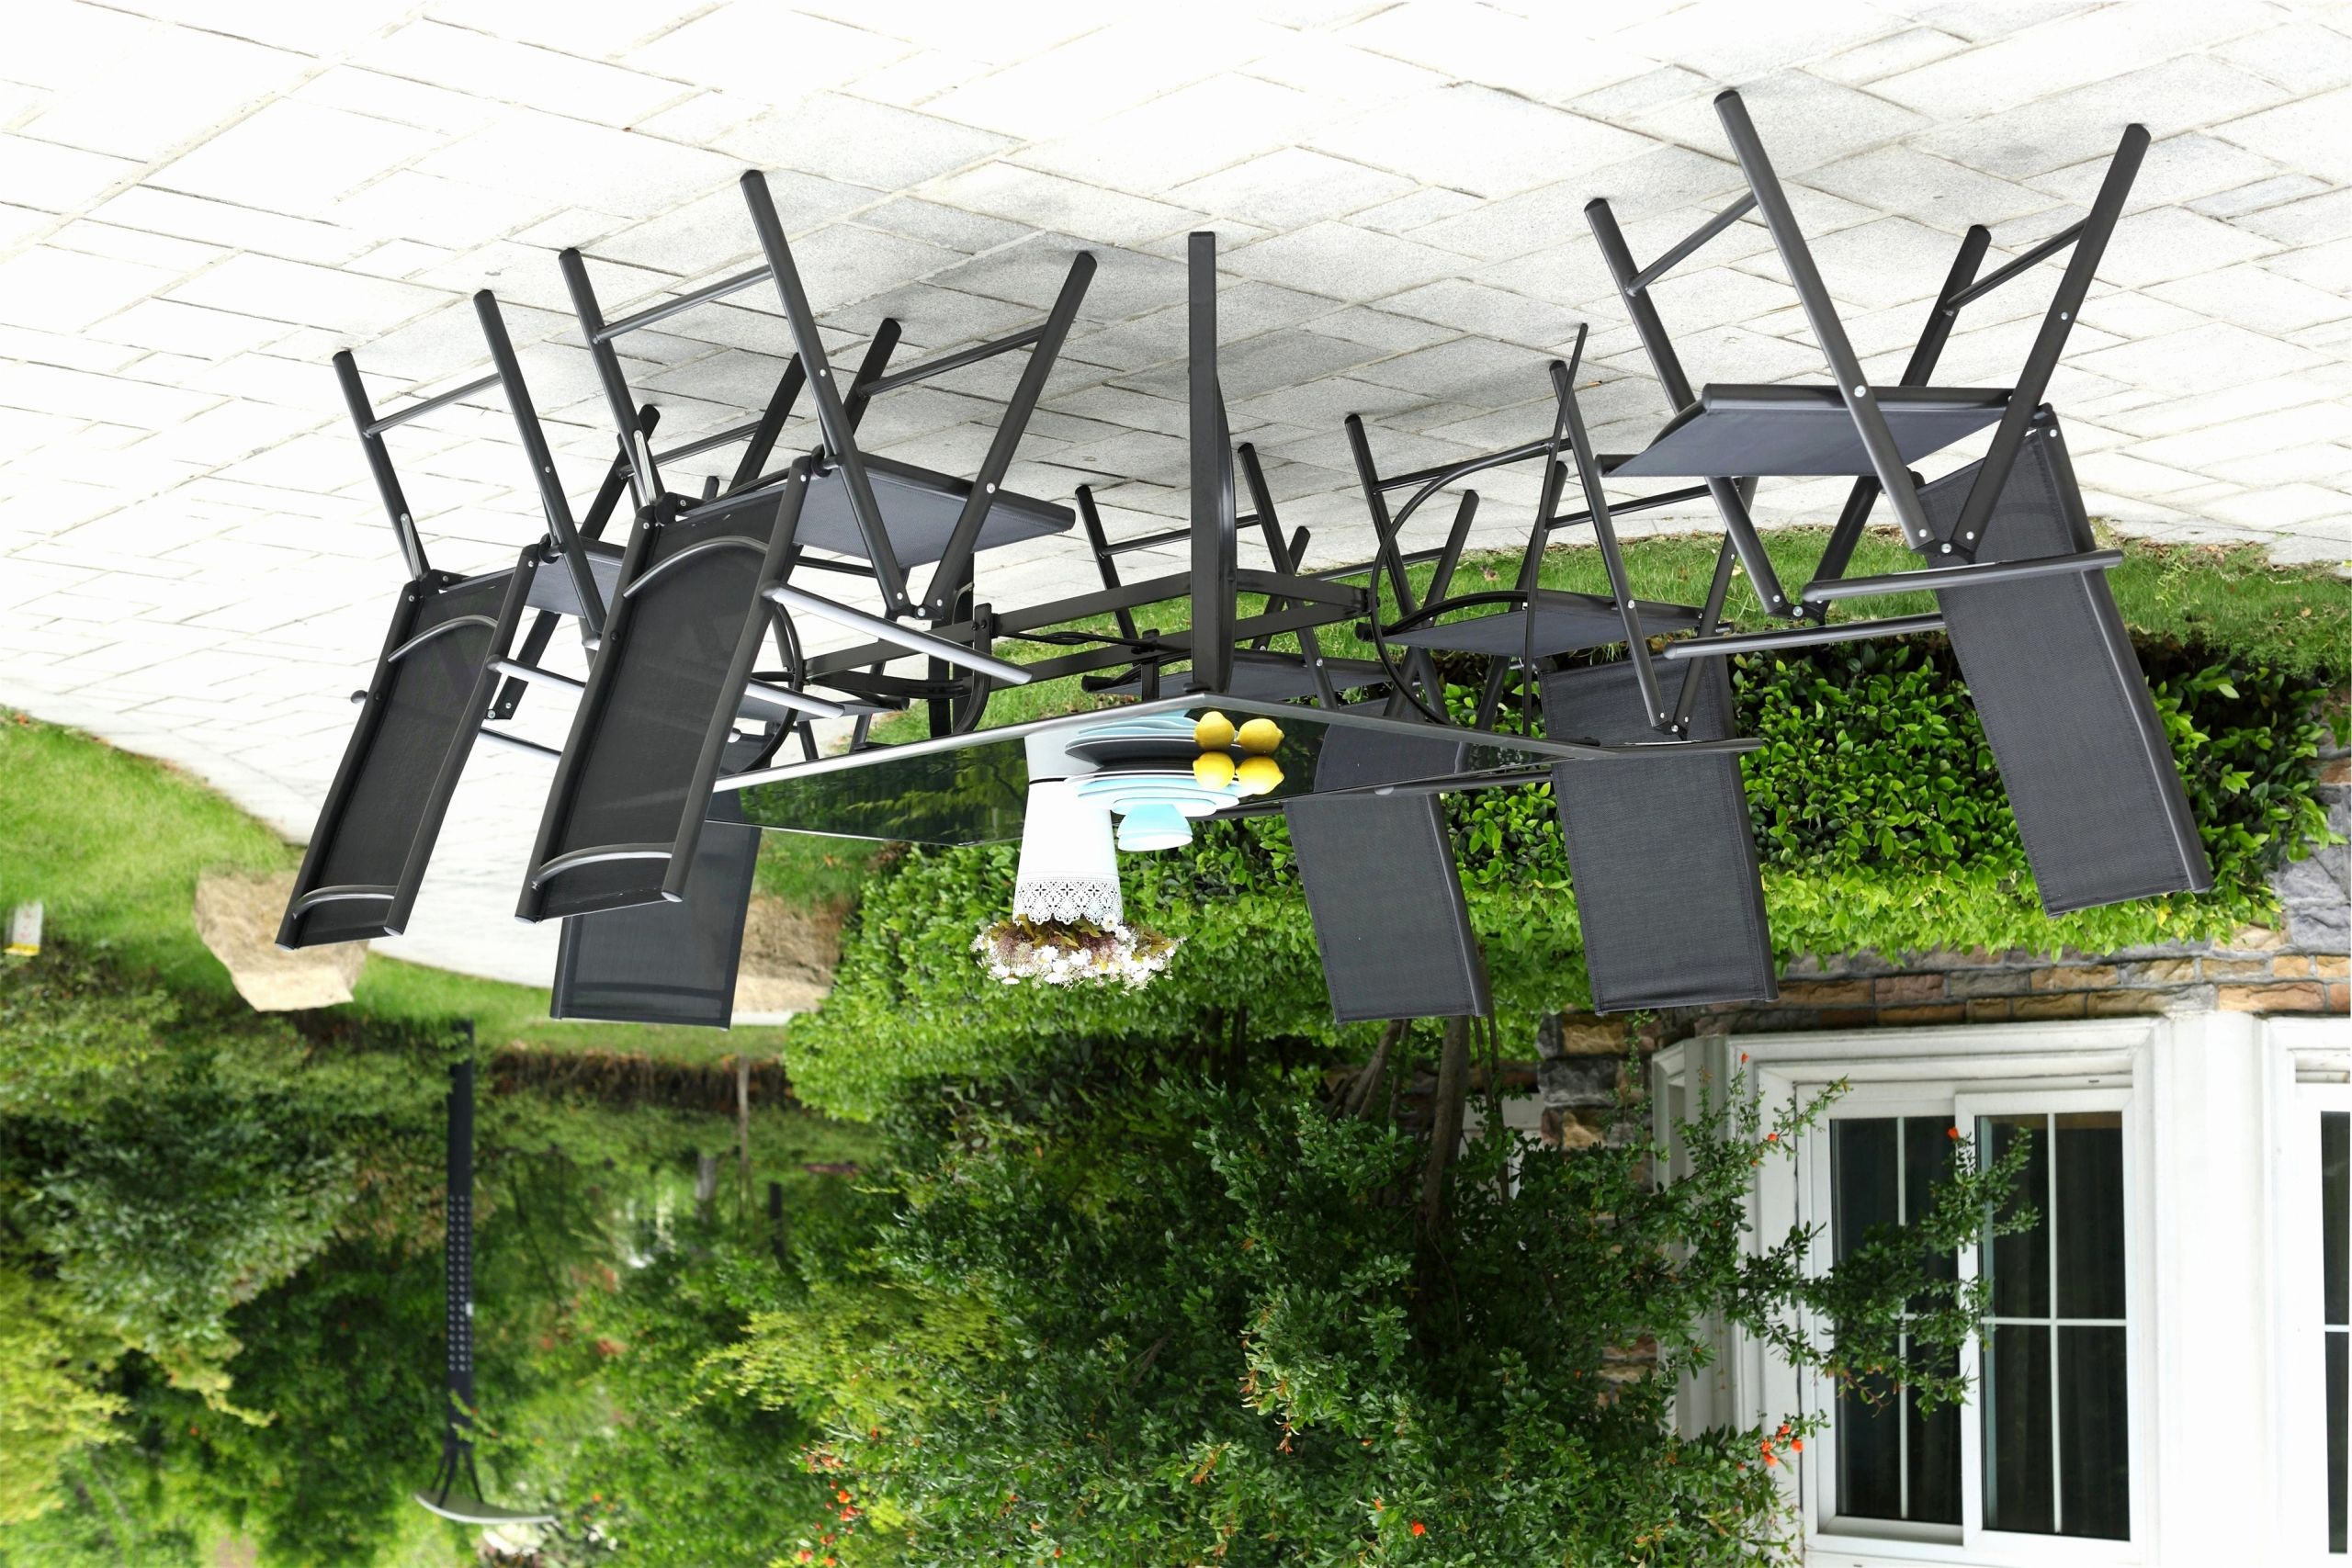 Mobilier De Jardin Alinea Best Of 77 Génial Table Jardin ... encequiconcerne Chaise Jardin Alinea